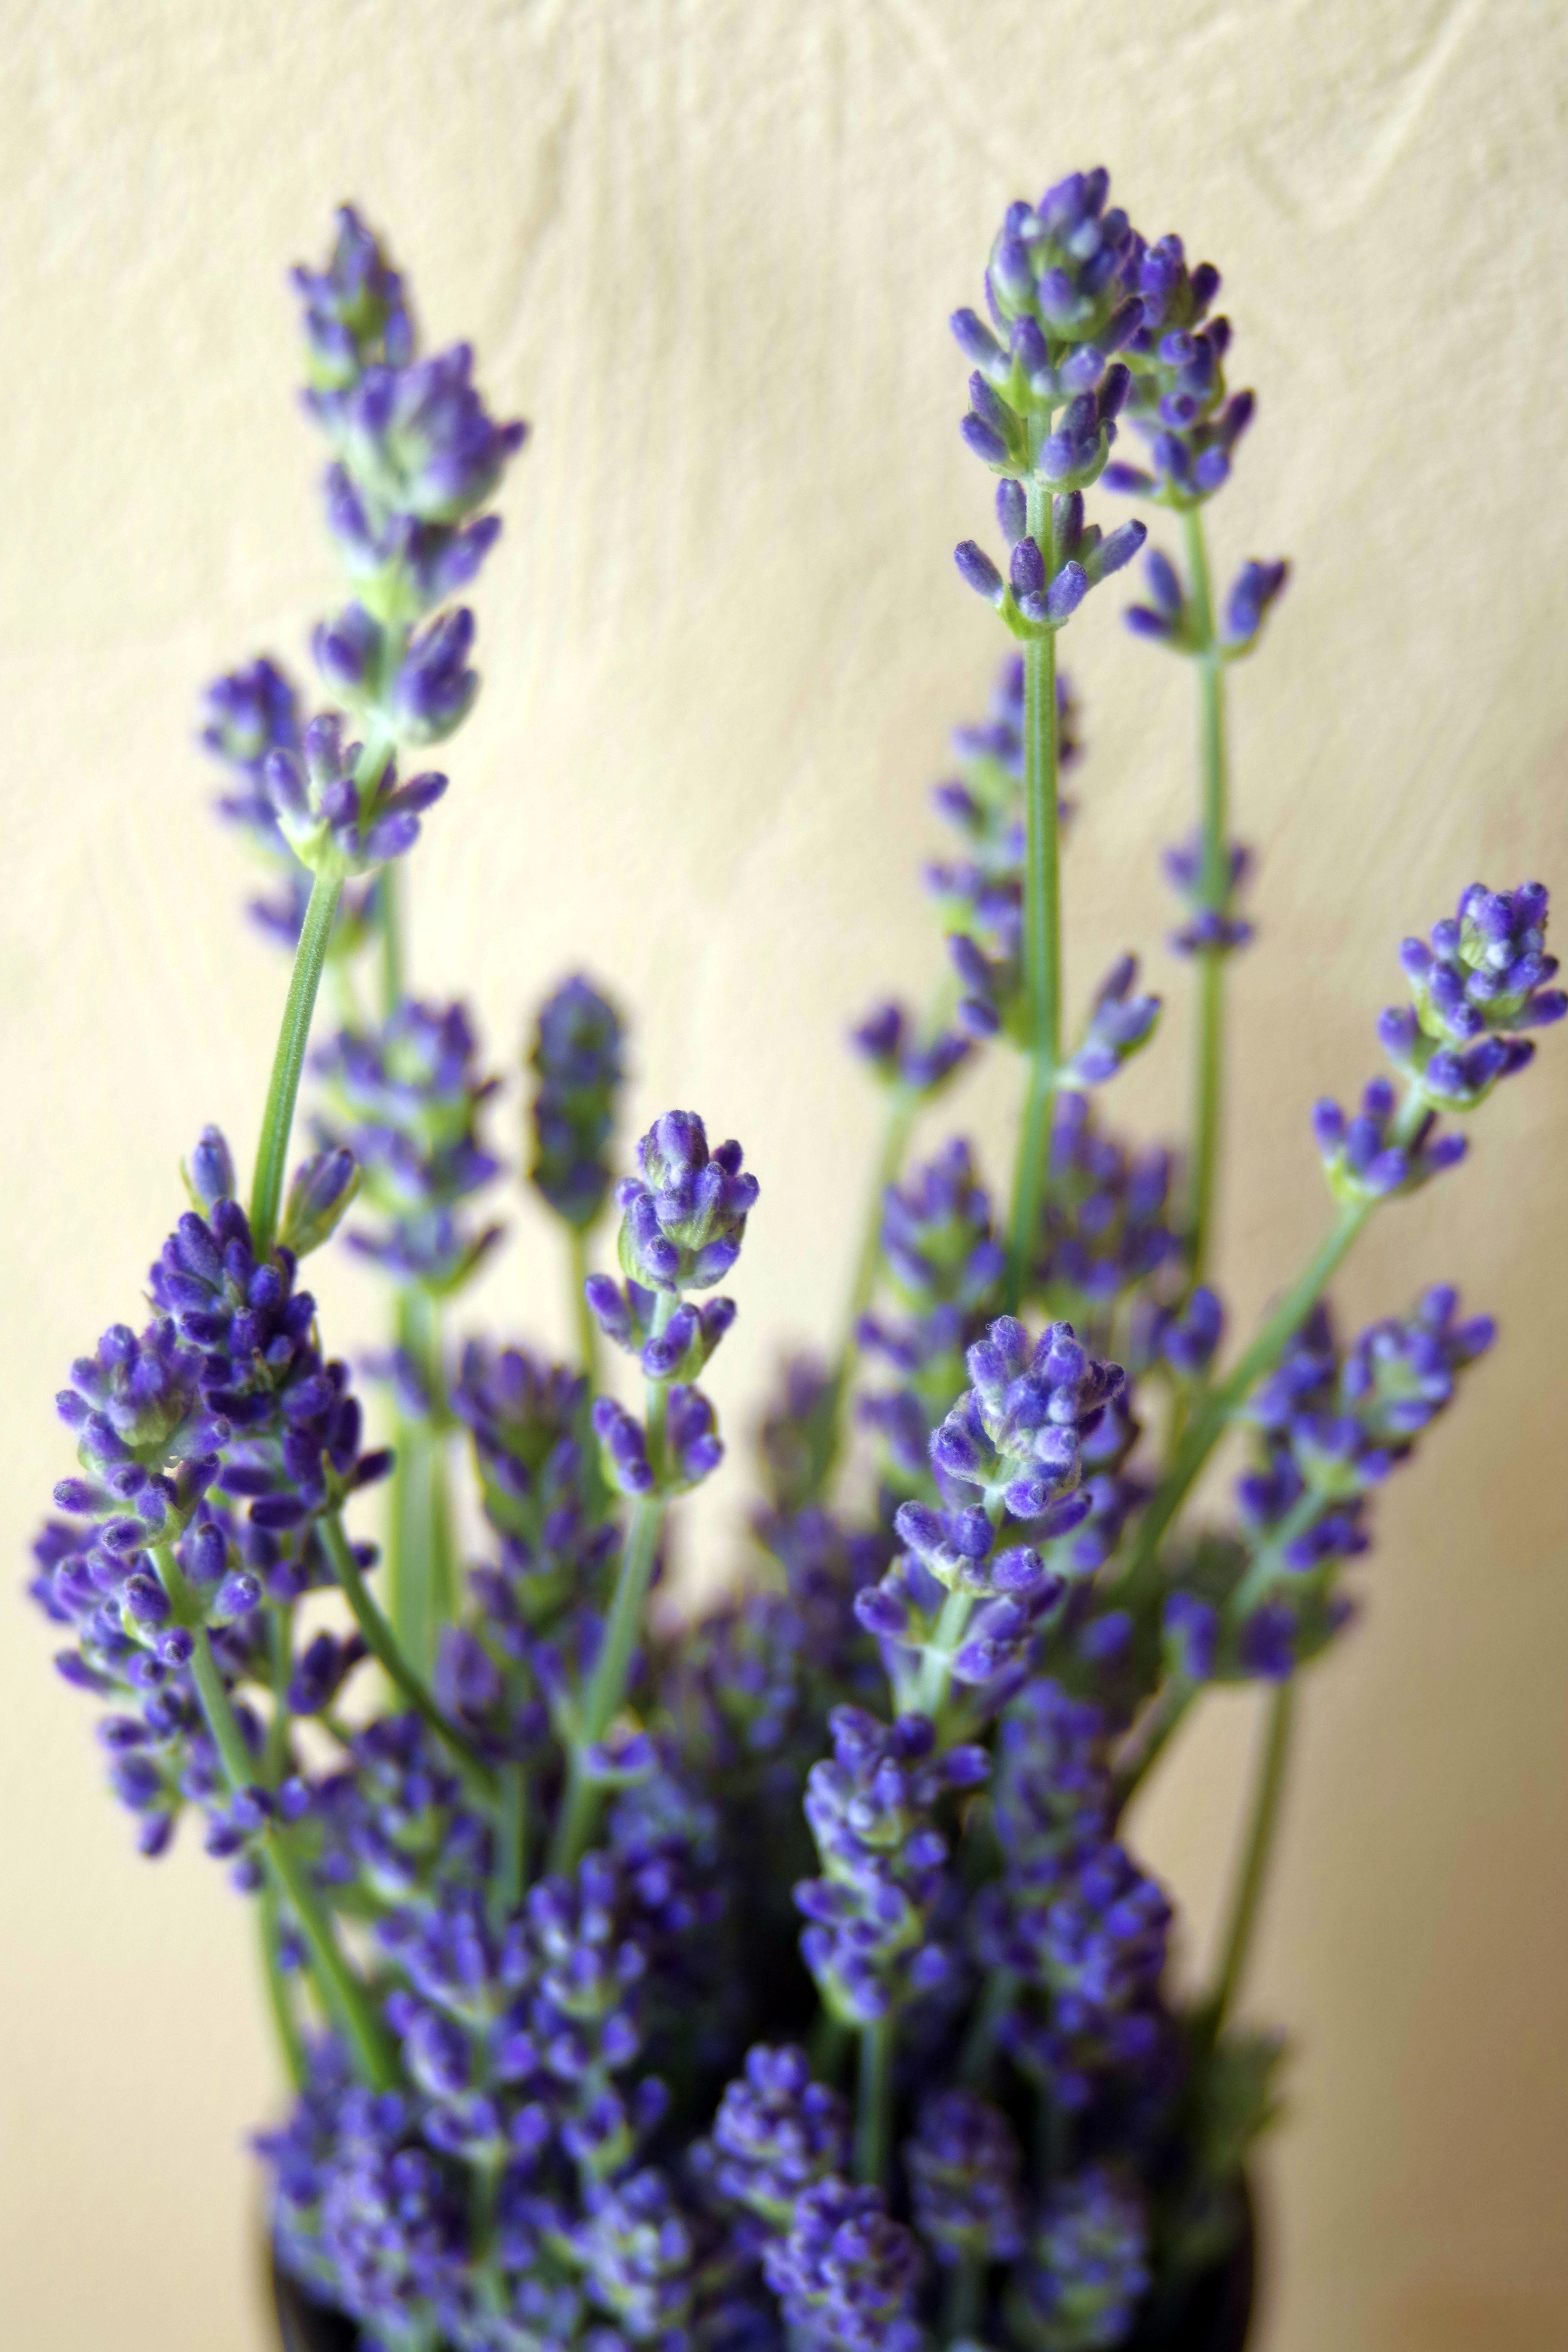 Free Images : nature, decoration, herb, botany, blue, flora ...